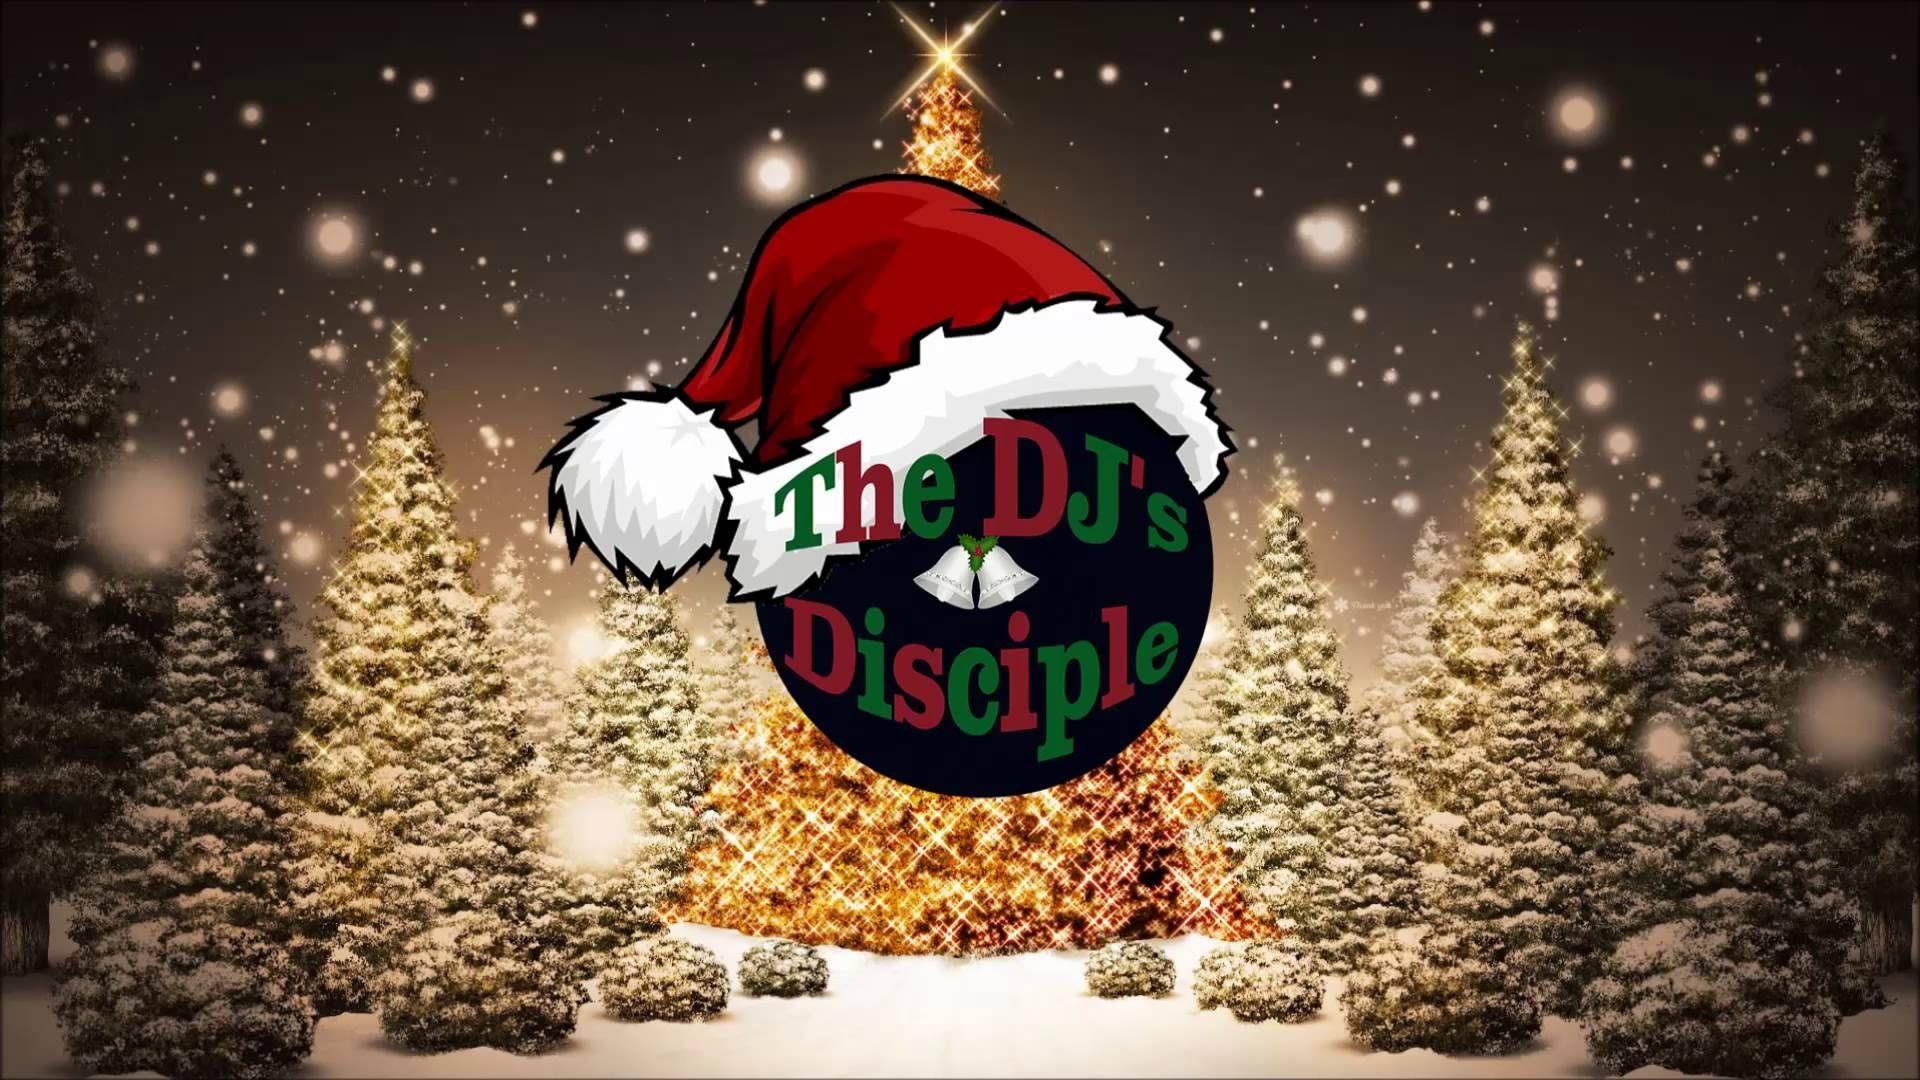 New Epic Christmas Mix 2015 Trap Electro Dubstep Remixs